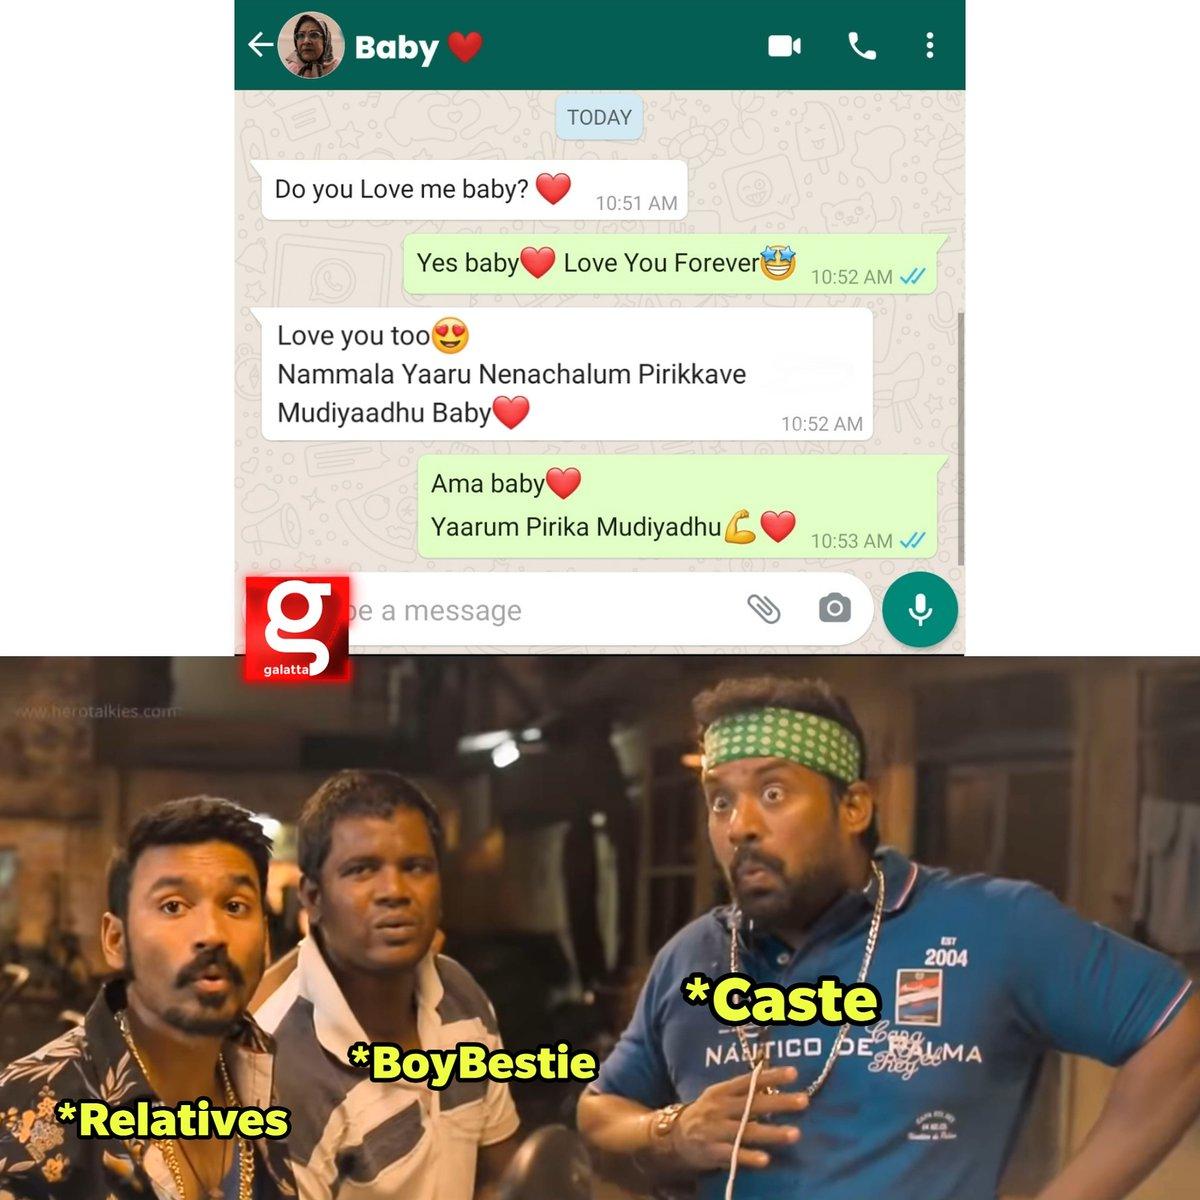 Ithudan Vilayattu Seidhigal Mudivu Adaikinrana 😌  #Love #Relationship #Whatsapp #Religion #BoyBestie #Caste https://t.co/YqnrVEvln4